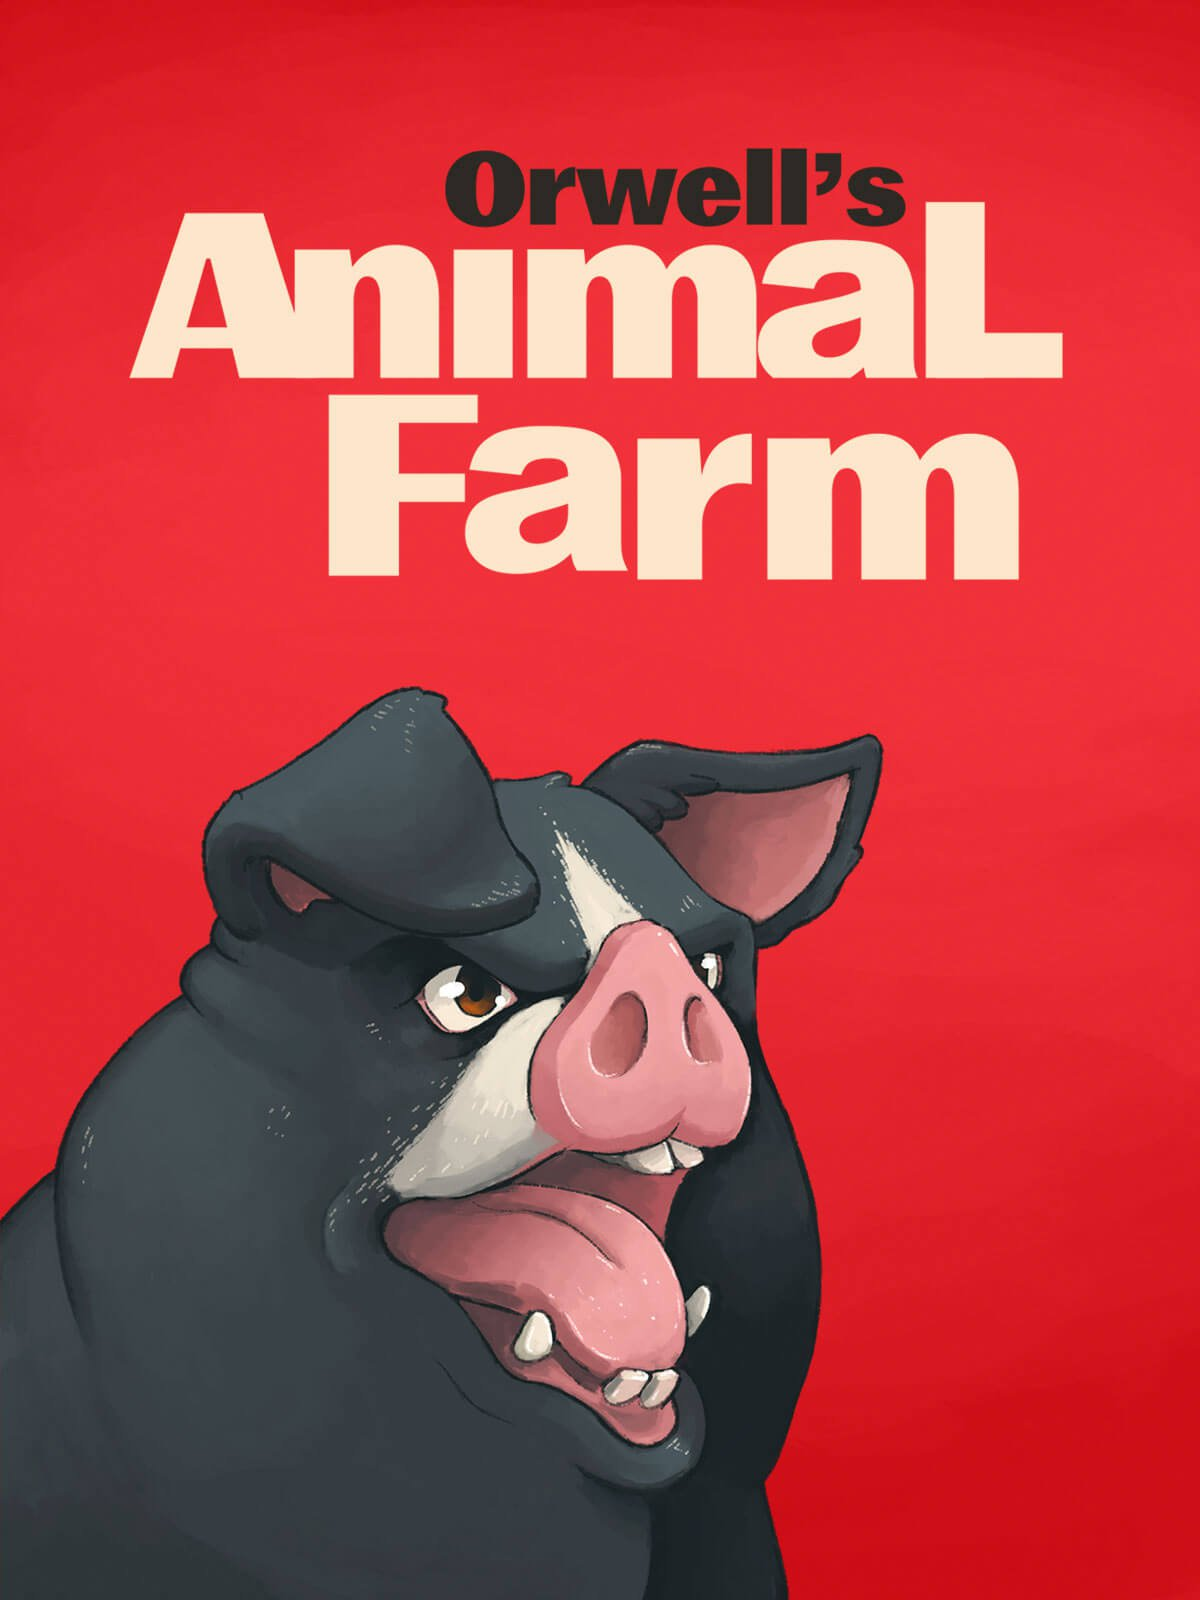 orwell-animal-farm.jpg